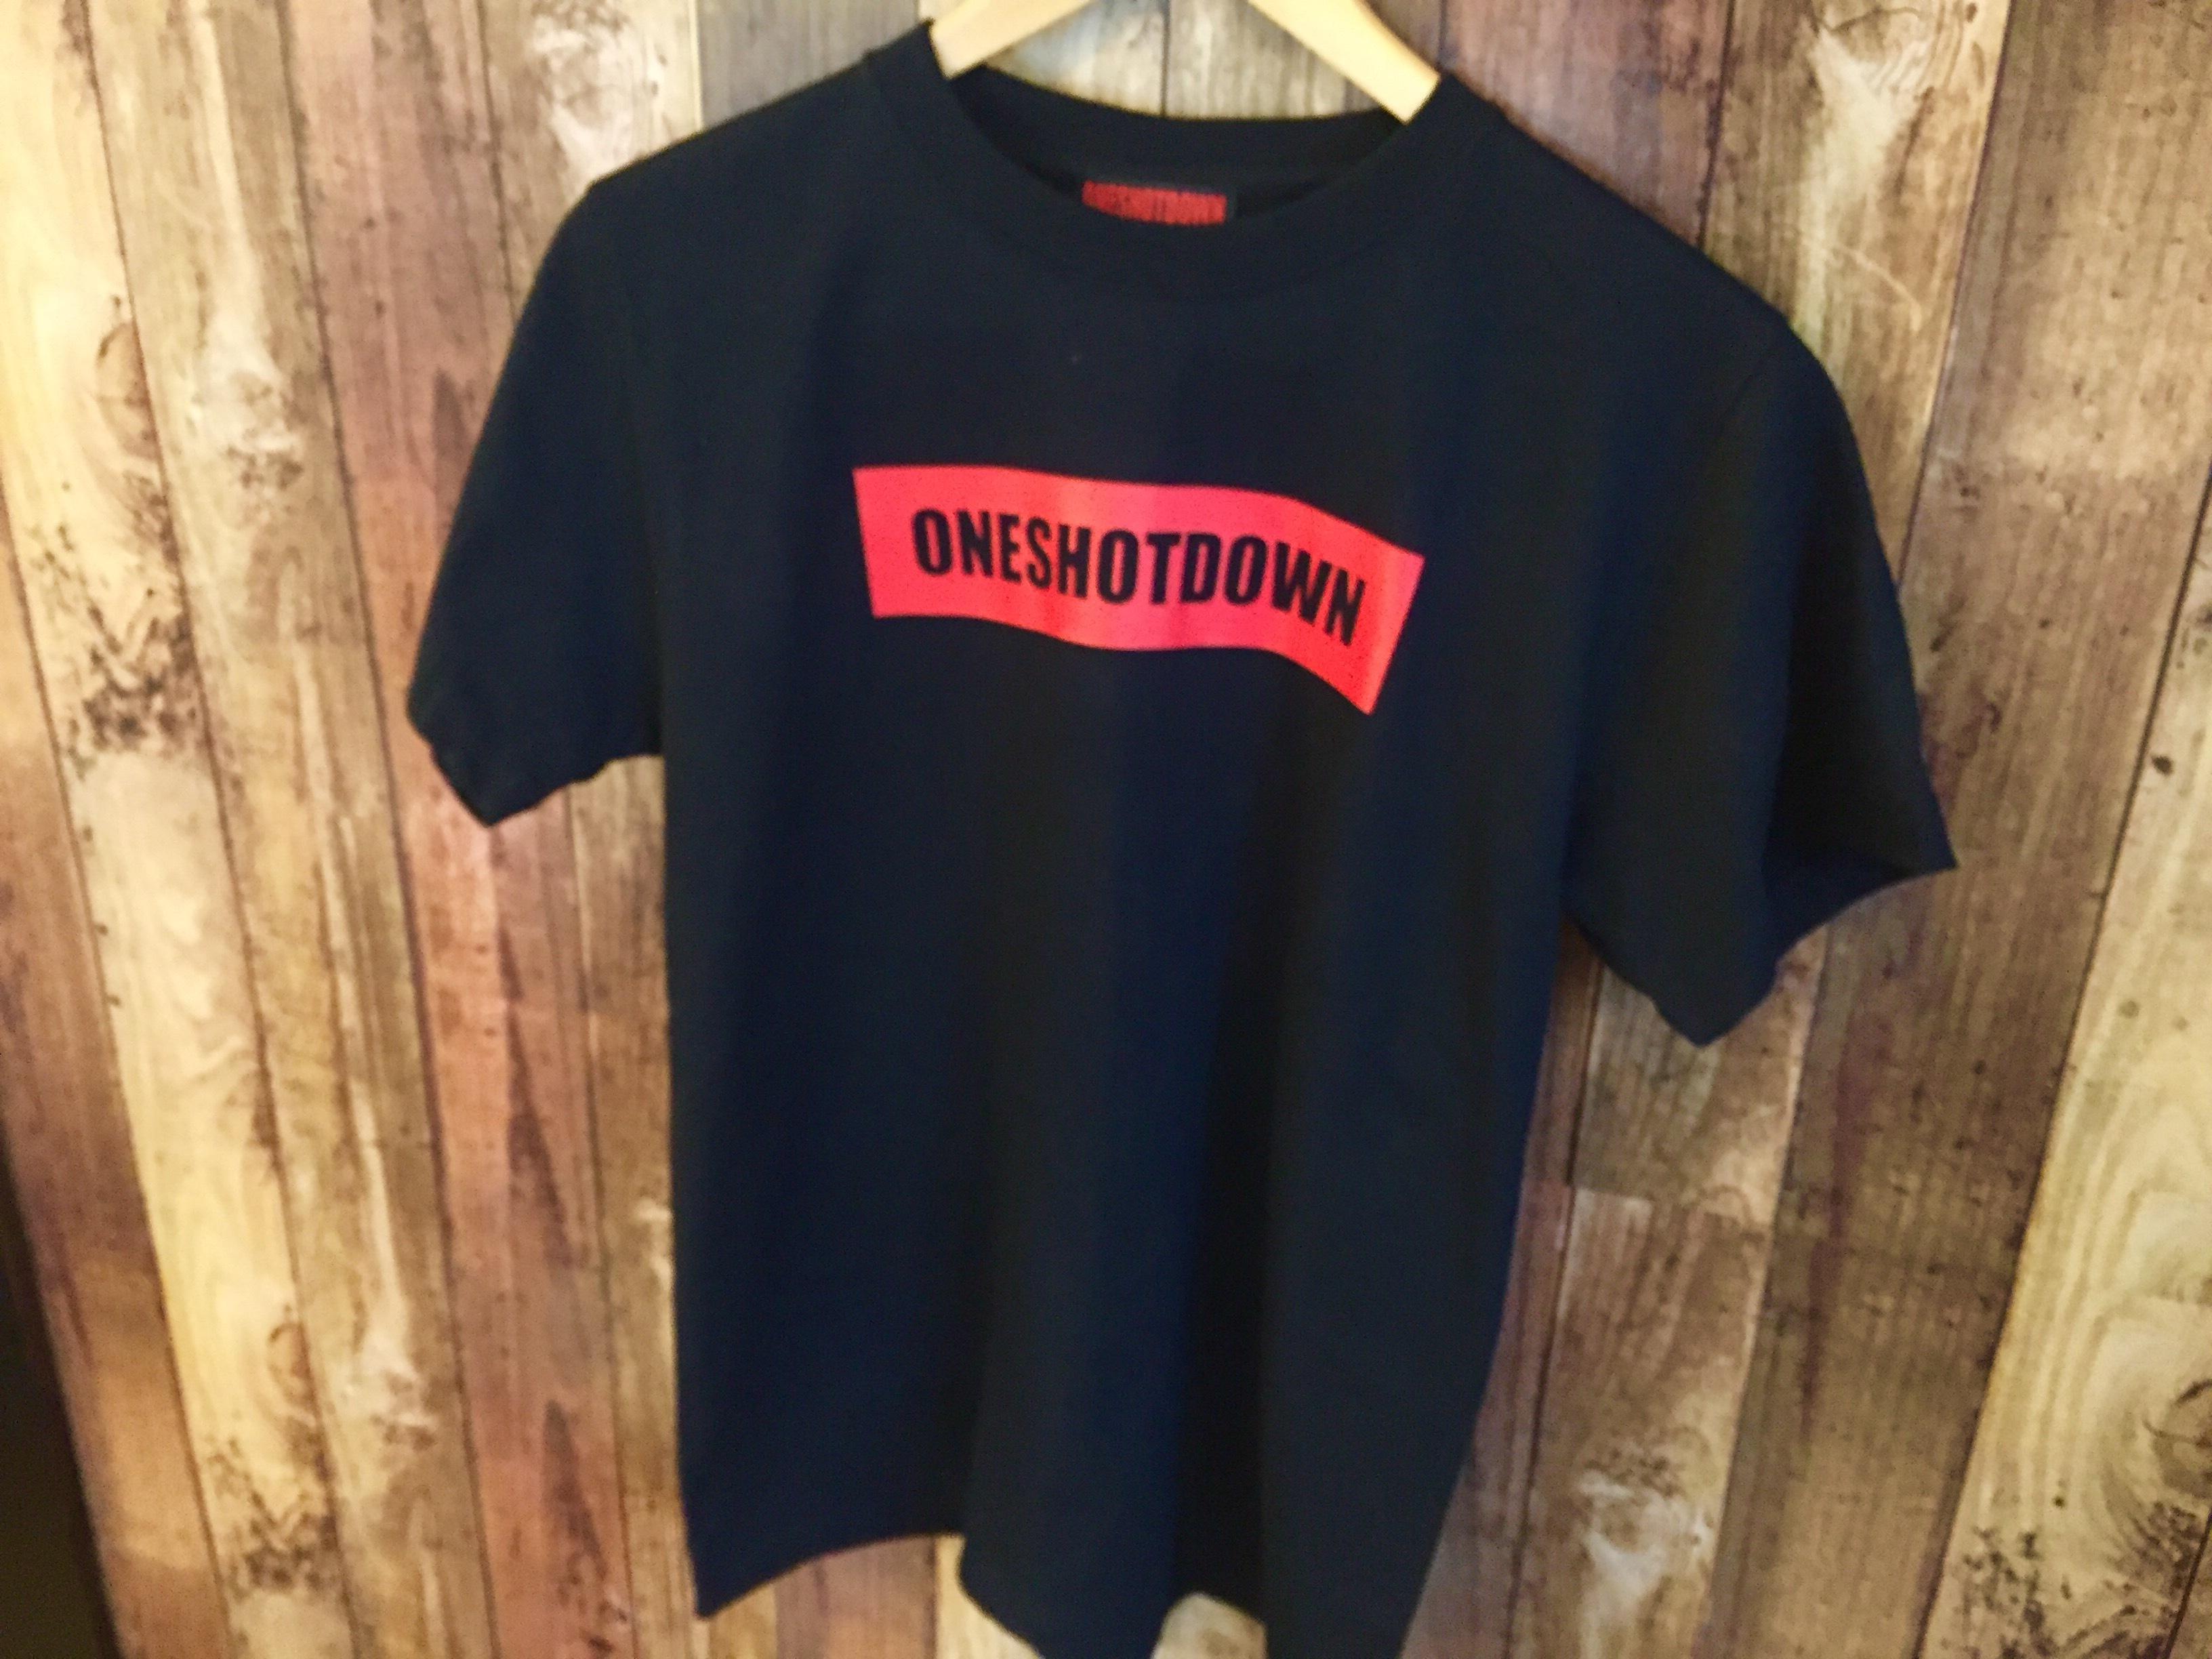 ONESHOTDOWN ボックスロゴ Tシャツ - 画像3